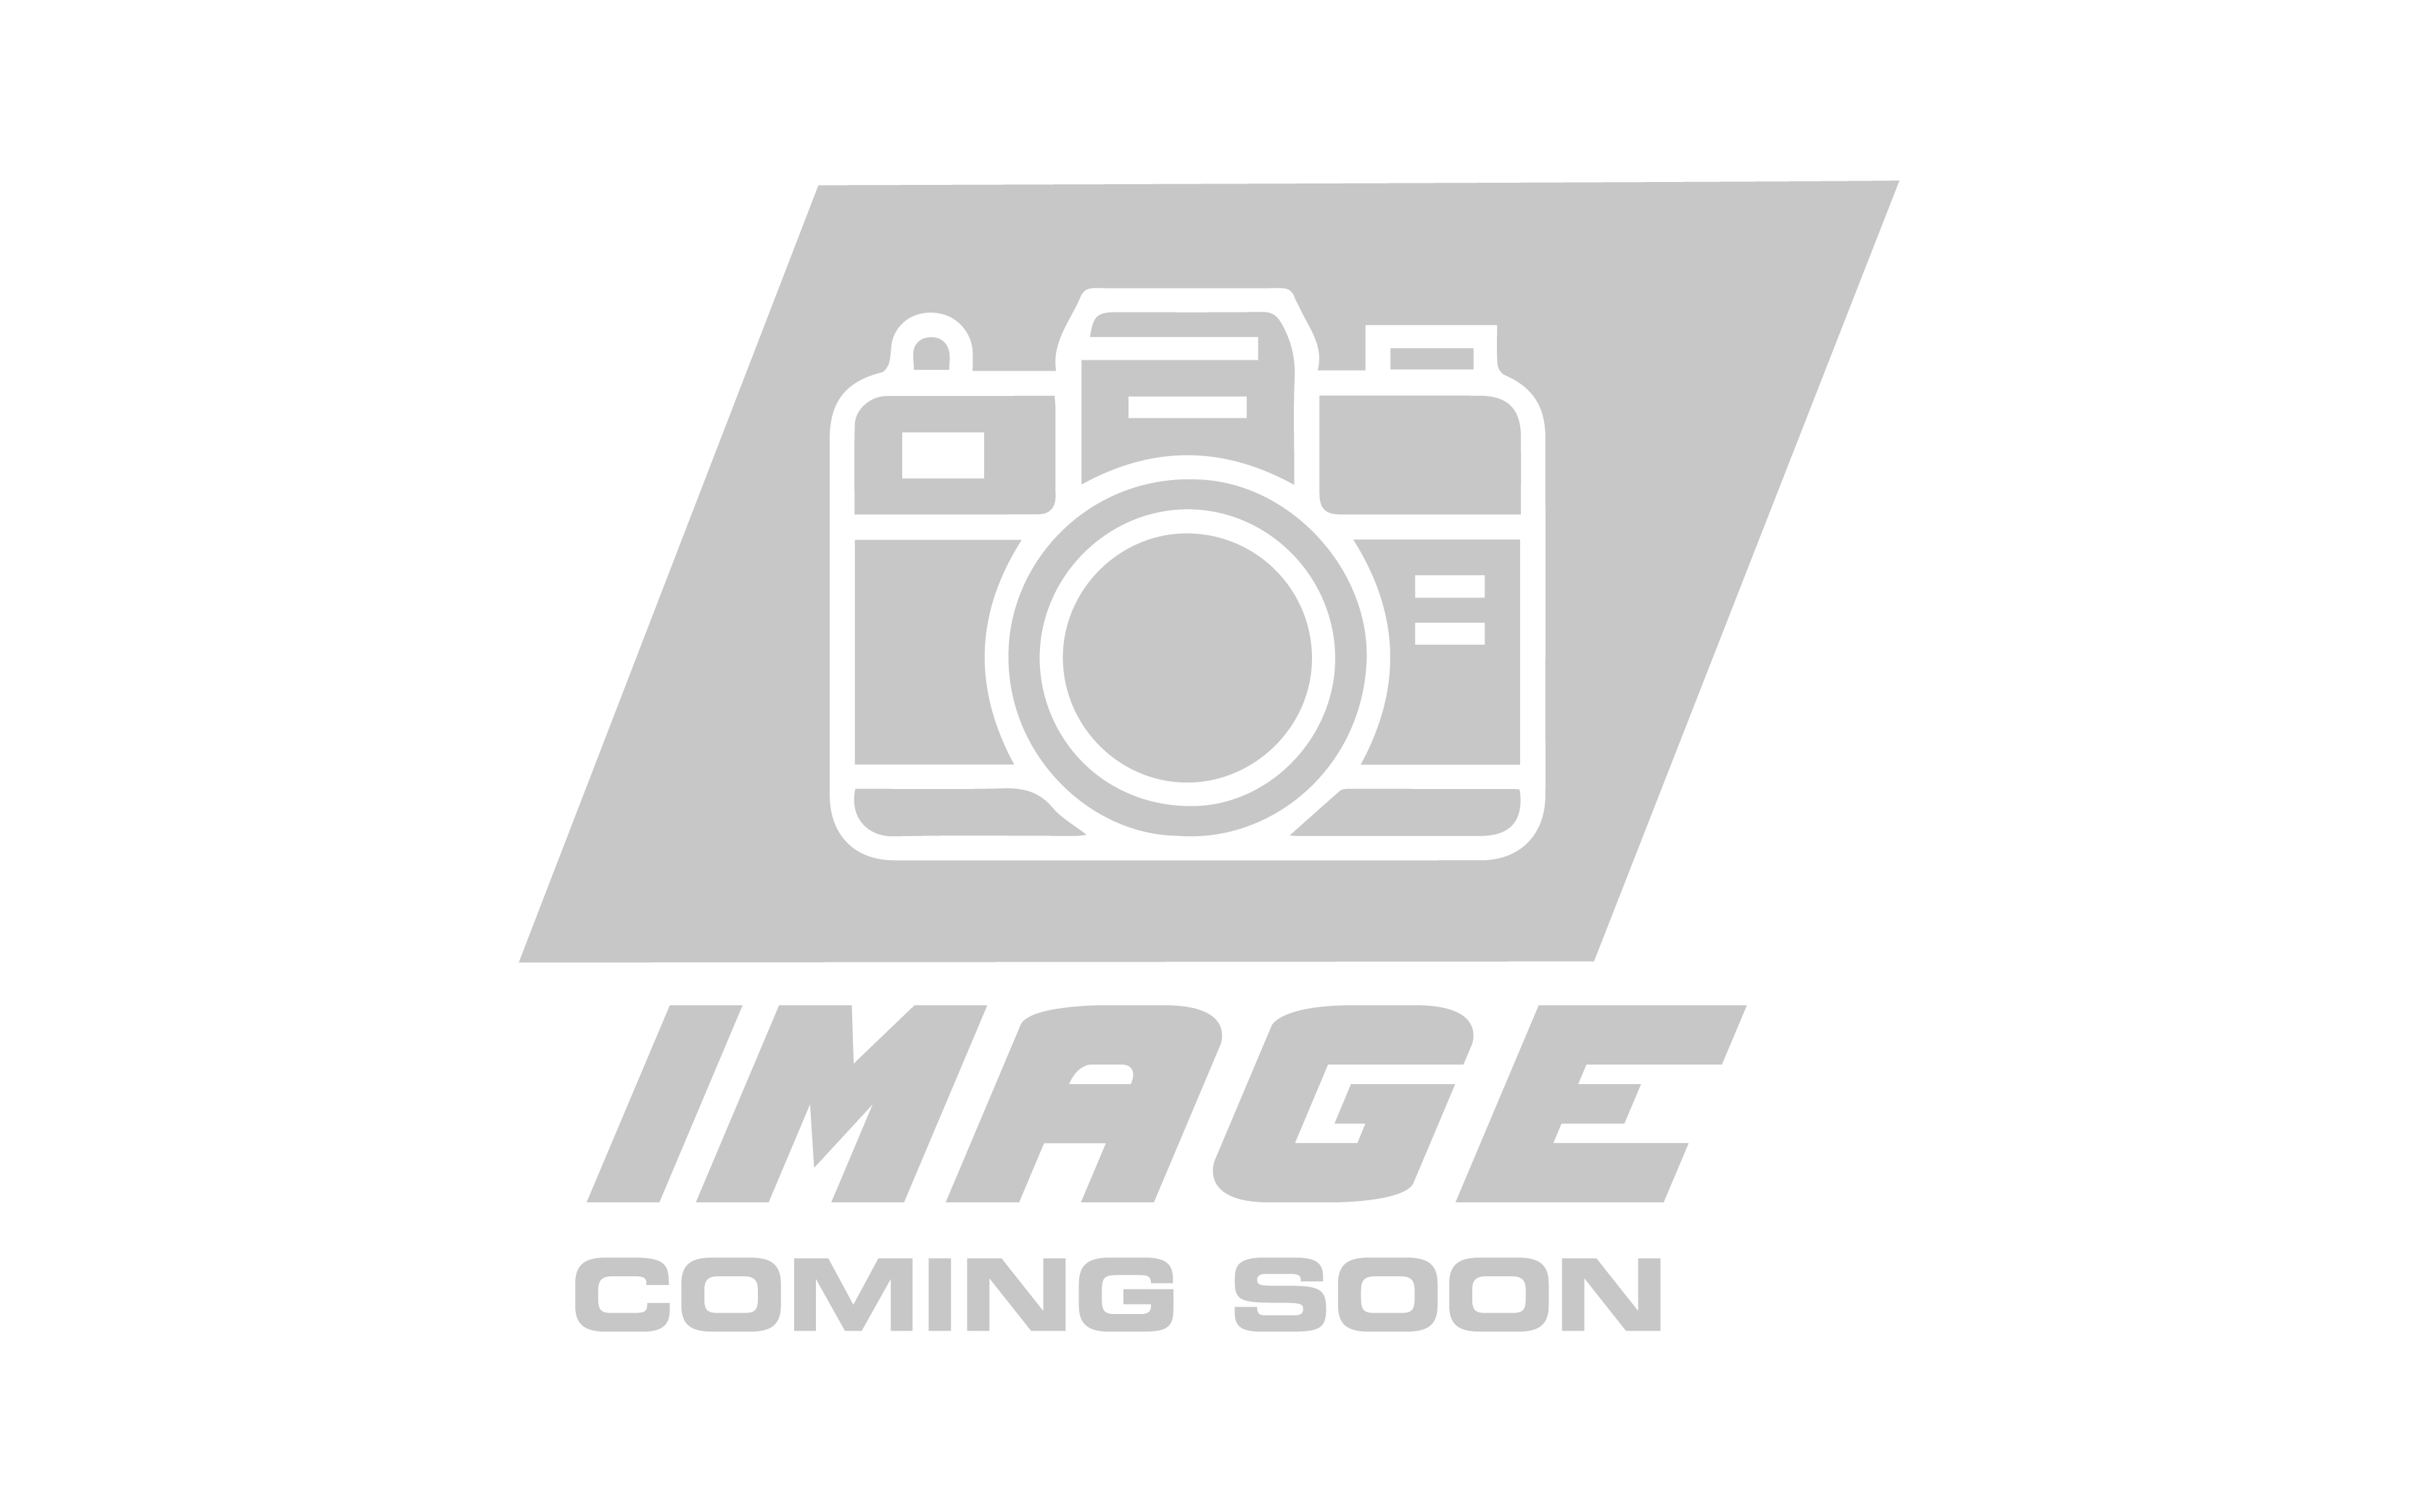 dodge_ram_2500_3500_air_lift_loadlifter_5000_rear_kit_57297